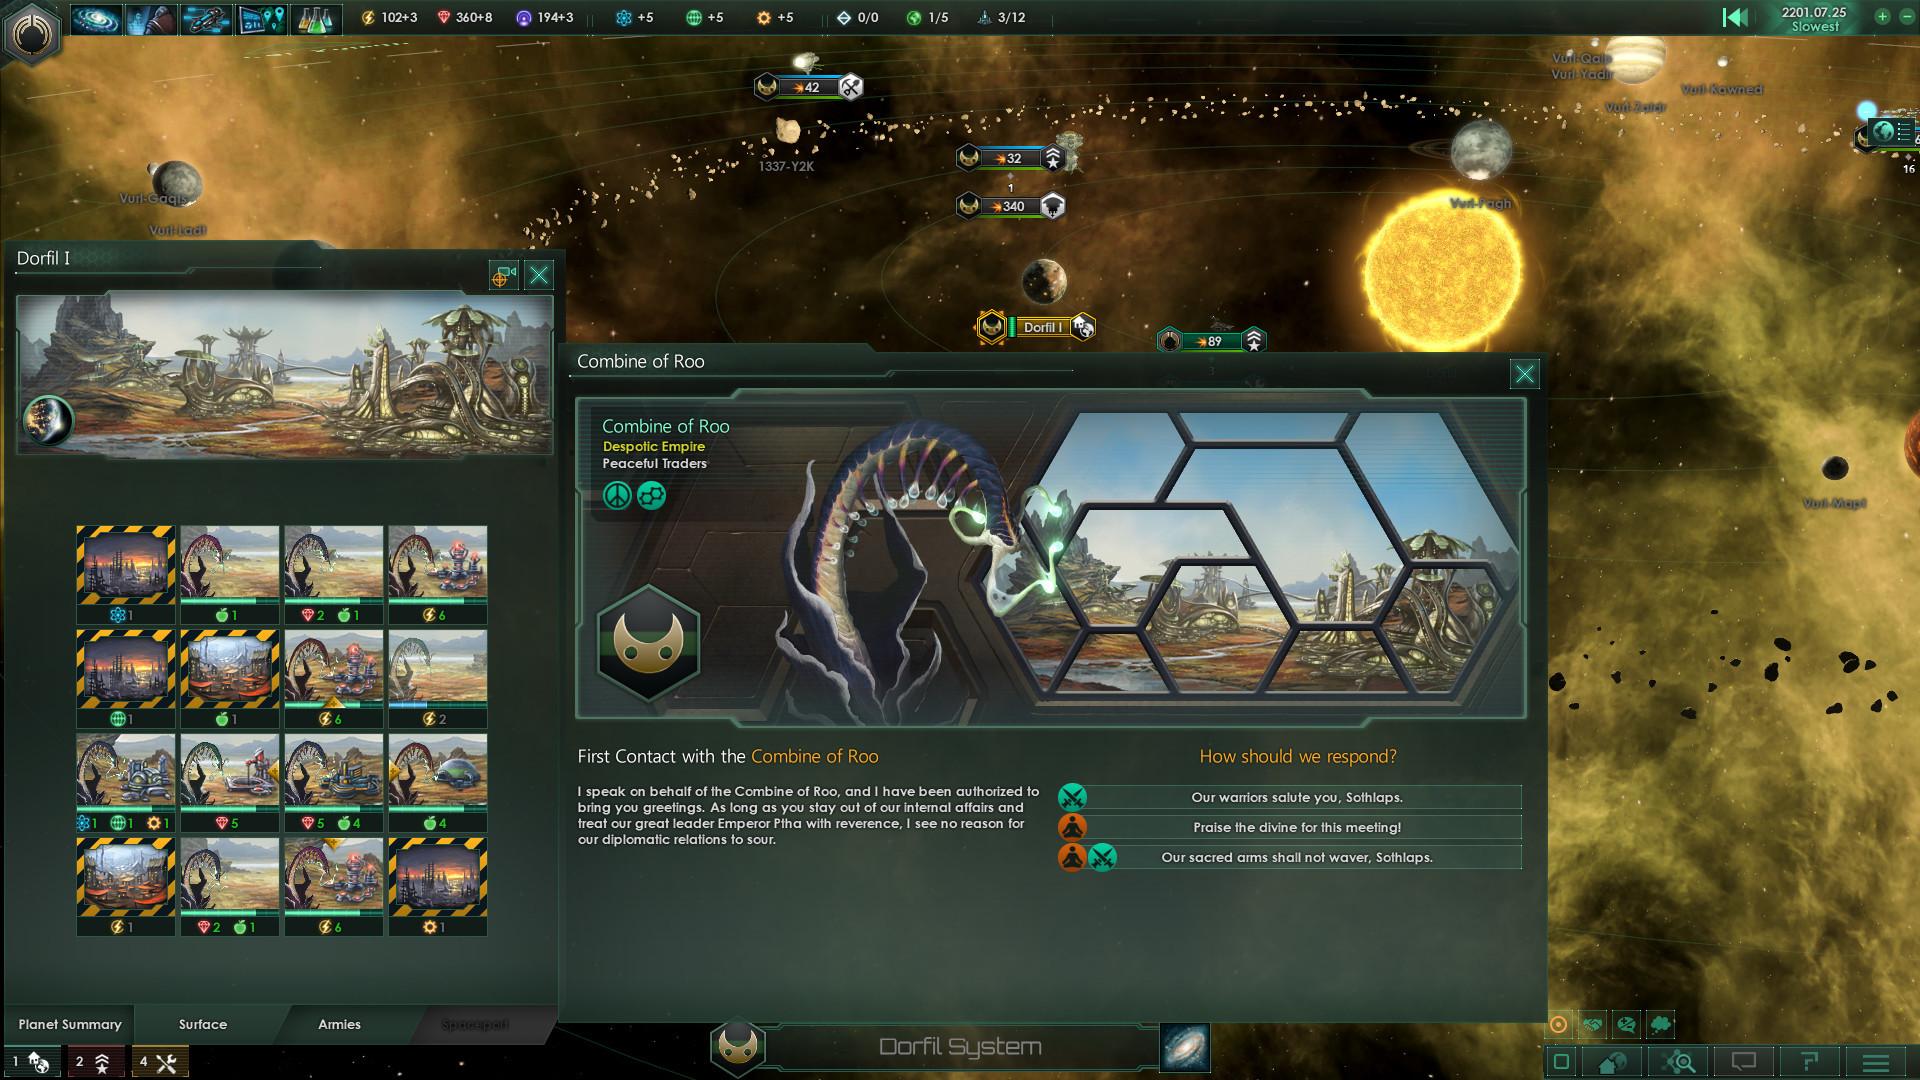 stellaris-galaxy-edition-pc-screenshot-02